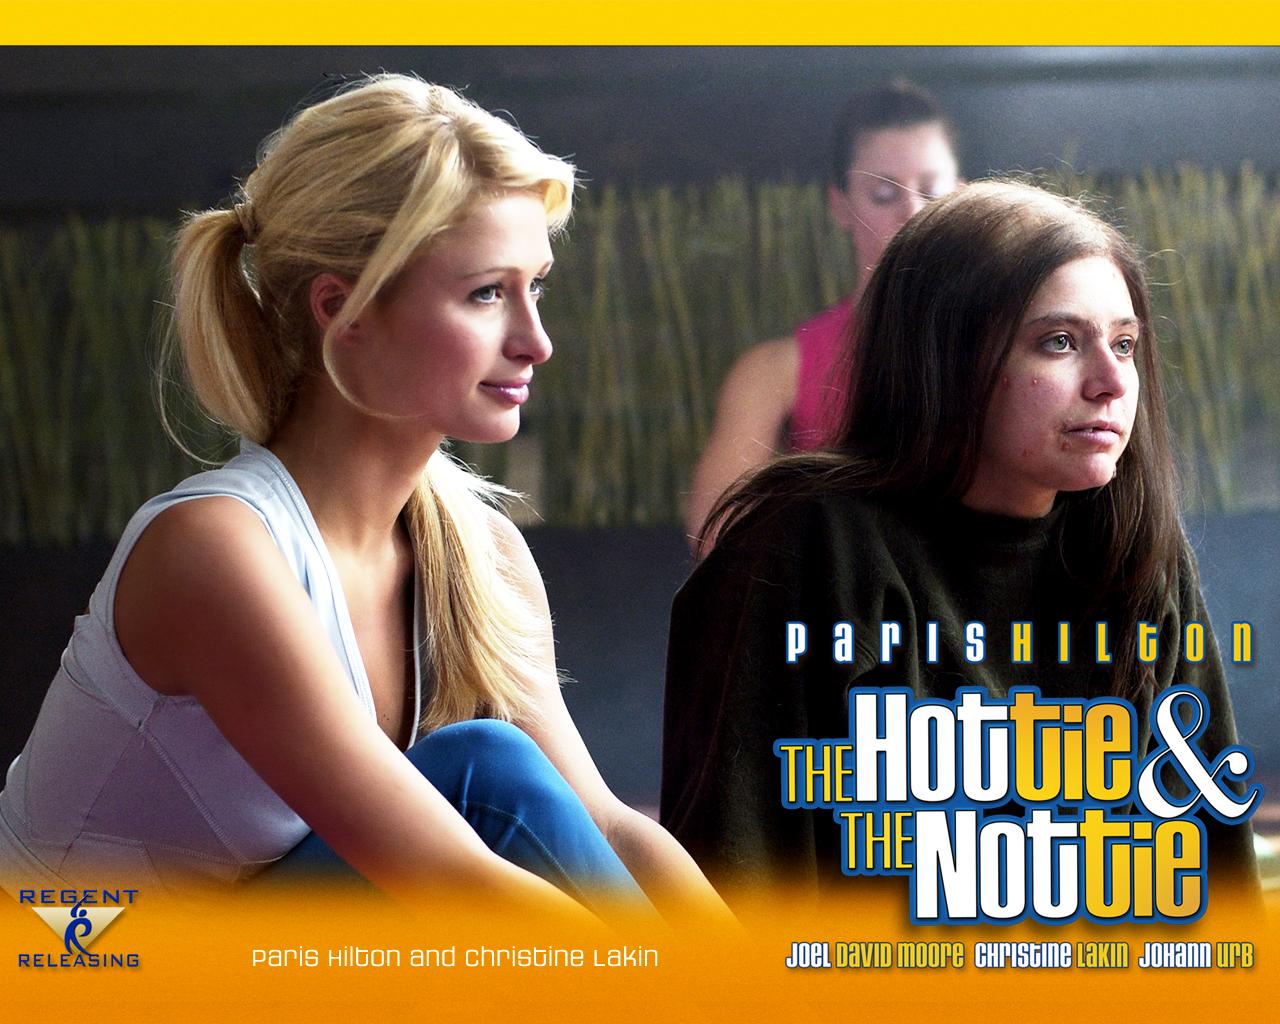 The Hottie And The Nottie 002 | Free Desktop Wallpapers ...